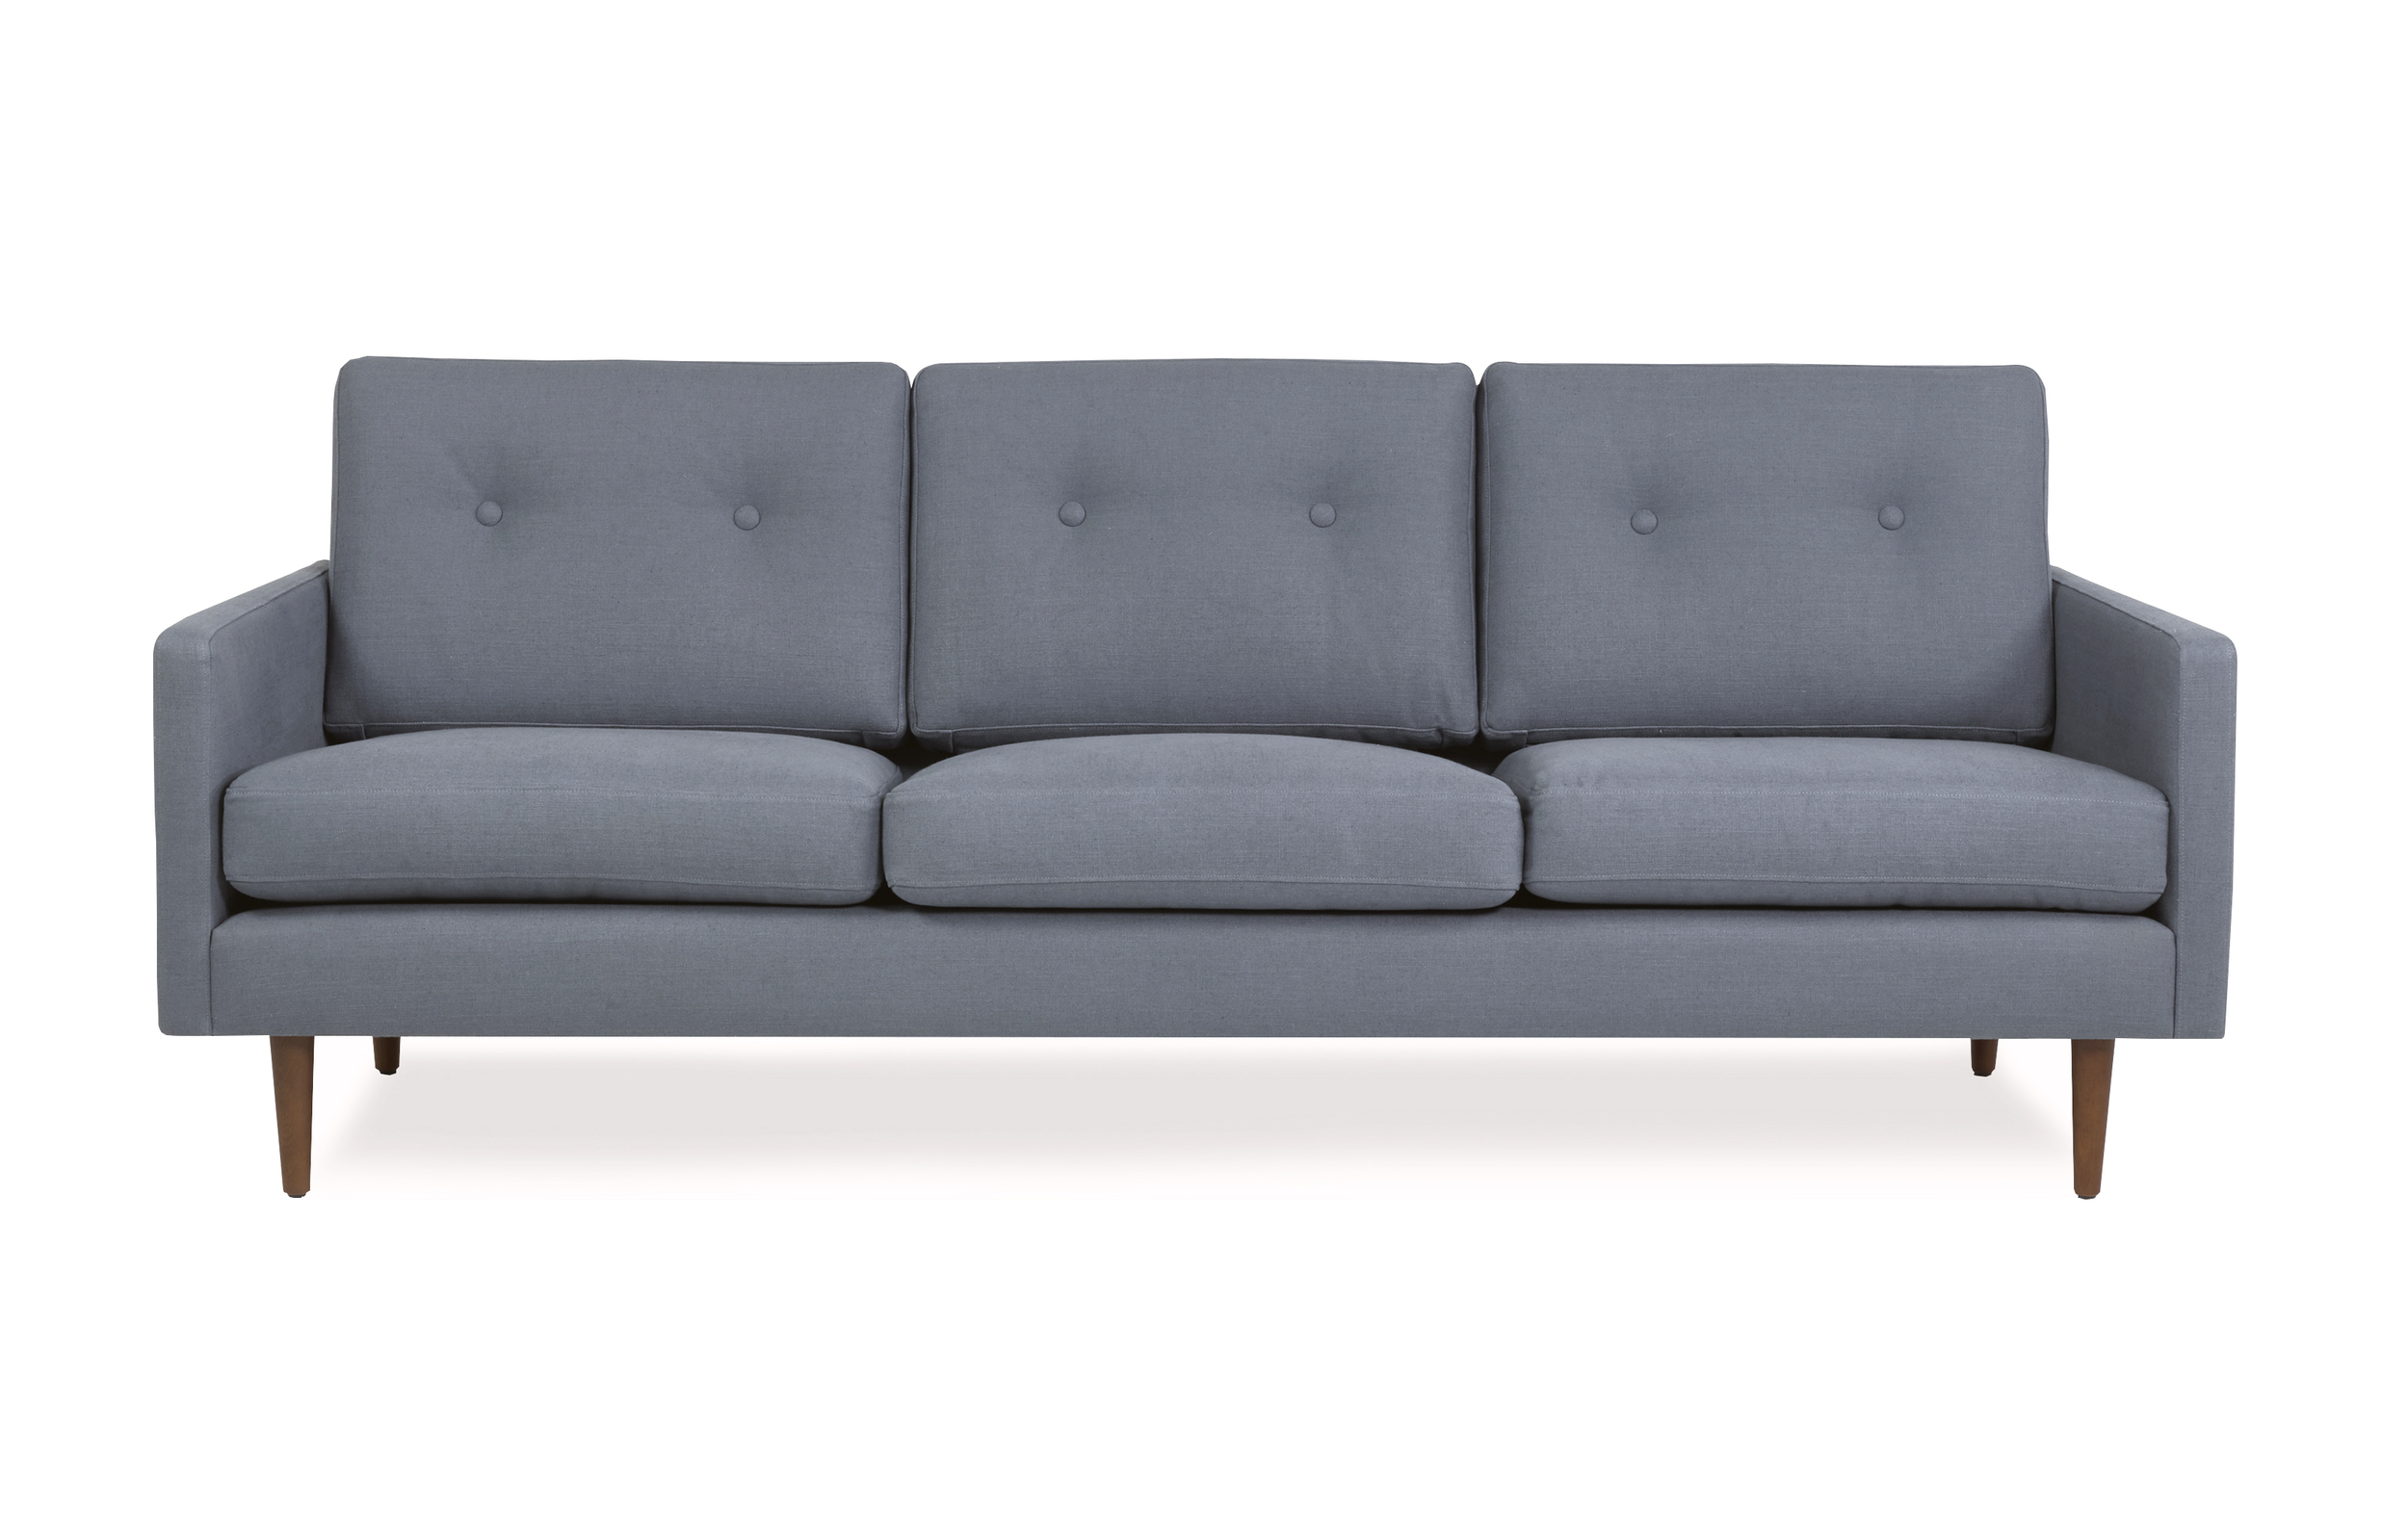 Midcentury Modern dark blue 3 seater sofa